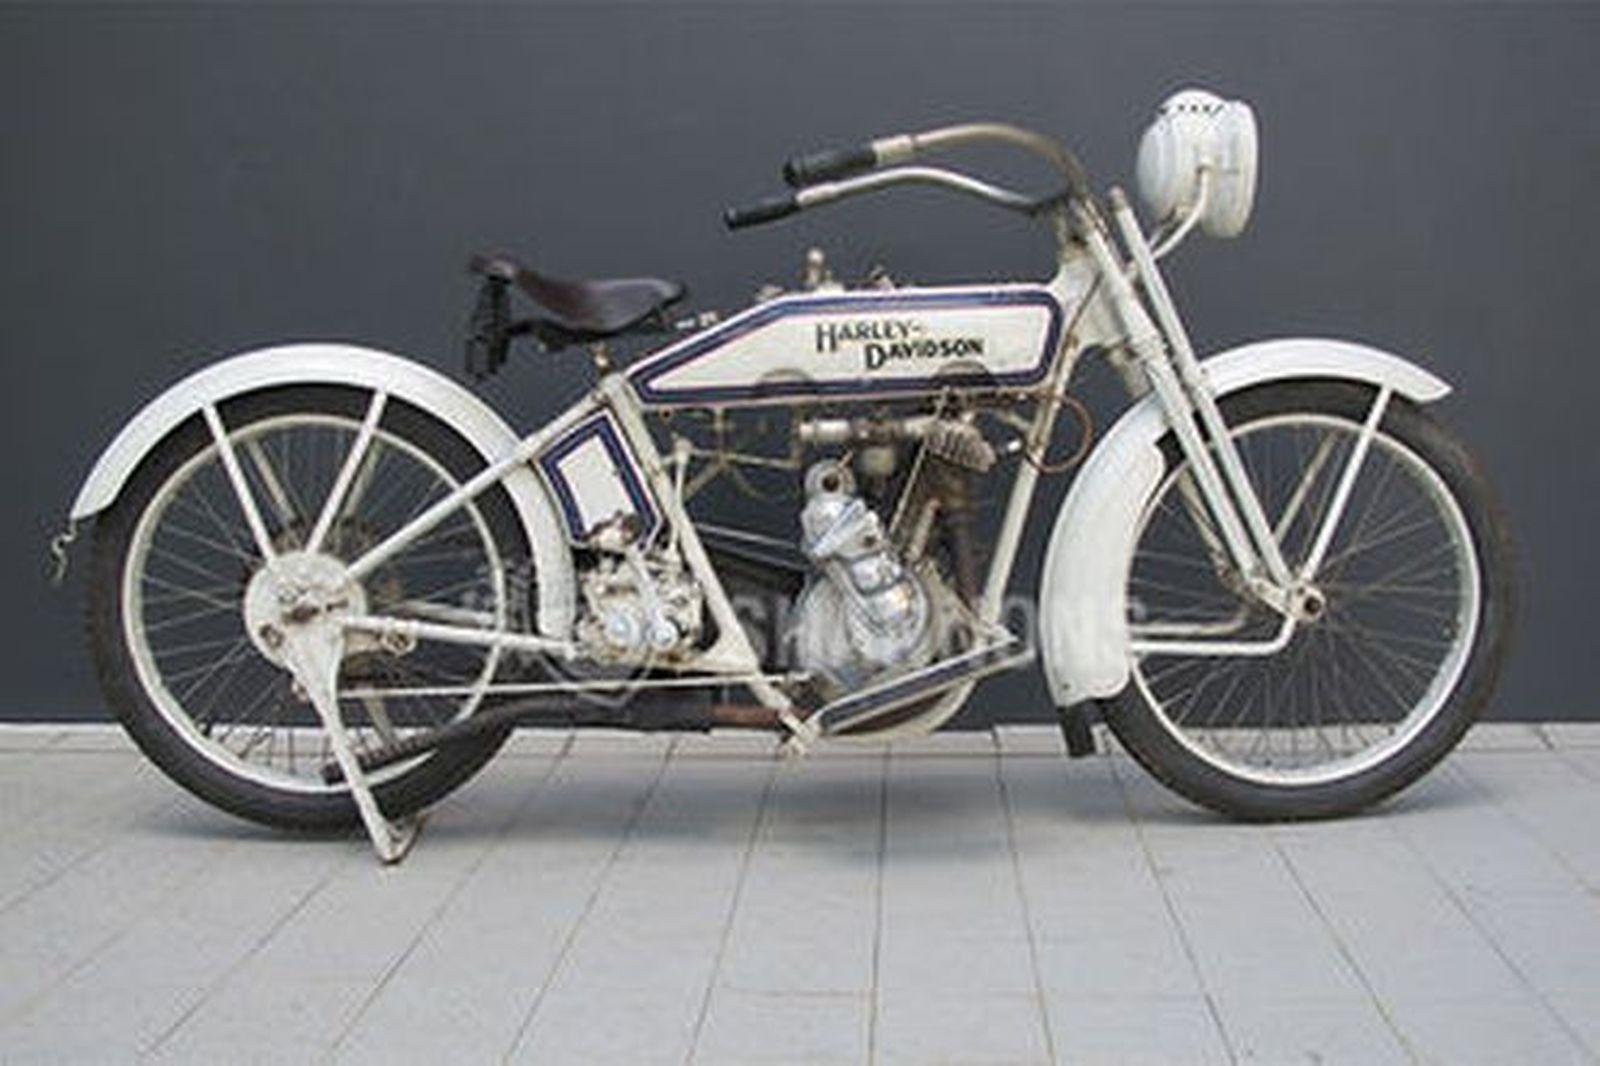 Harley davidson 16c single 35ci 575cc motorcycle auctions lot ah shannons - Sigle harley davidson ...